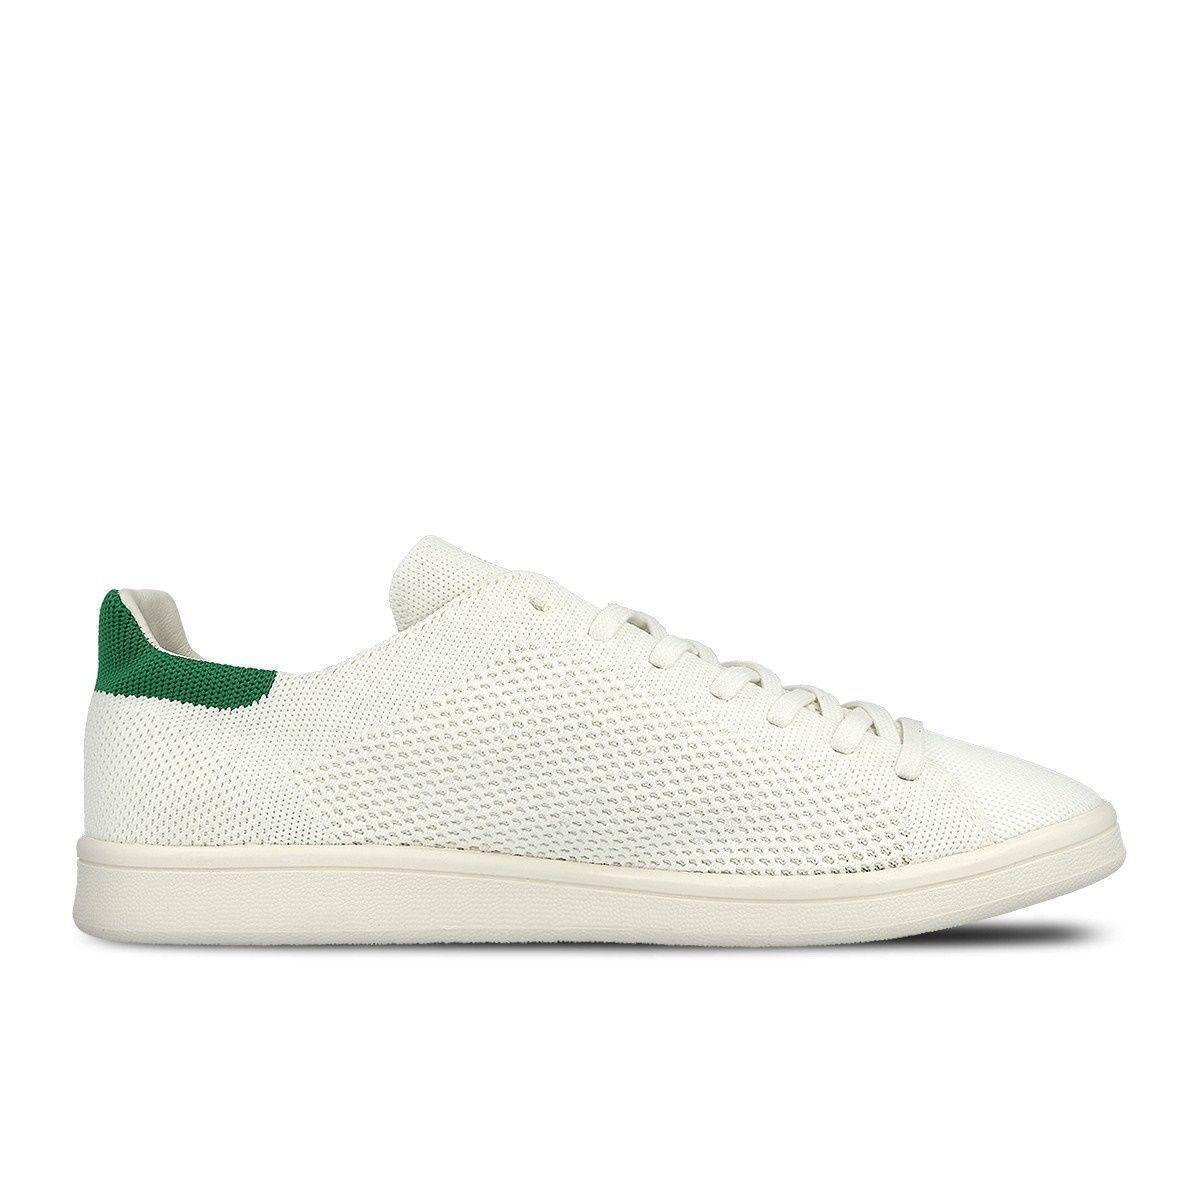 Hombre Adidas Stan Smith OG Pack Verde Blanco Verde Pack Zapatillas casual s75146 392d4d